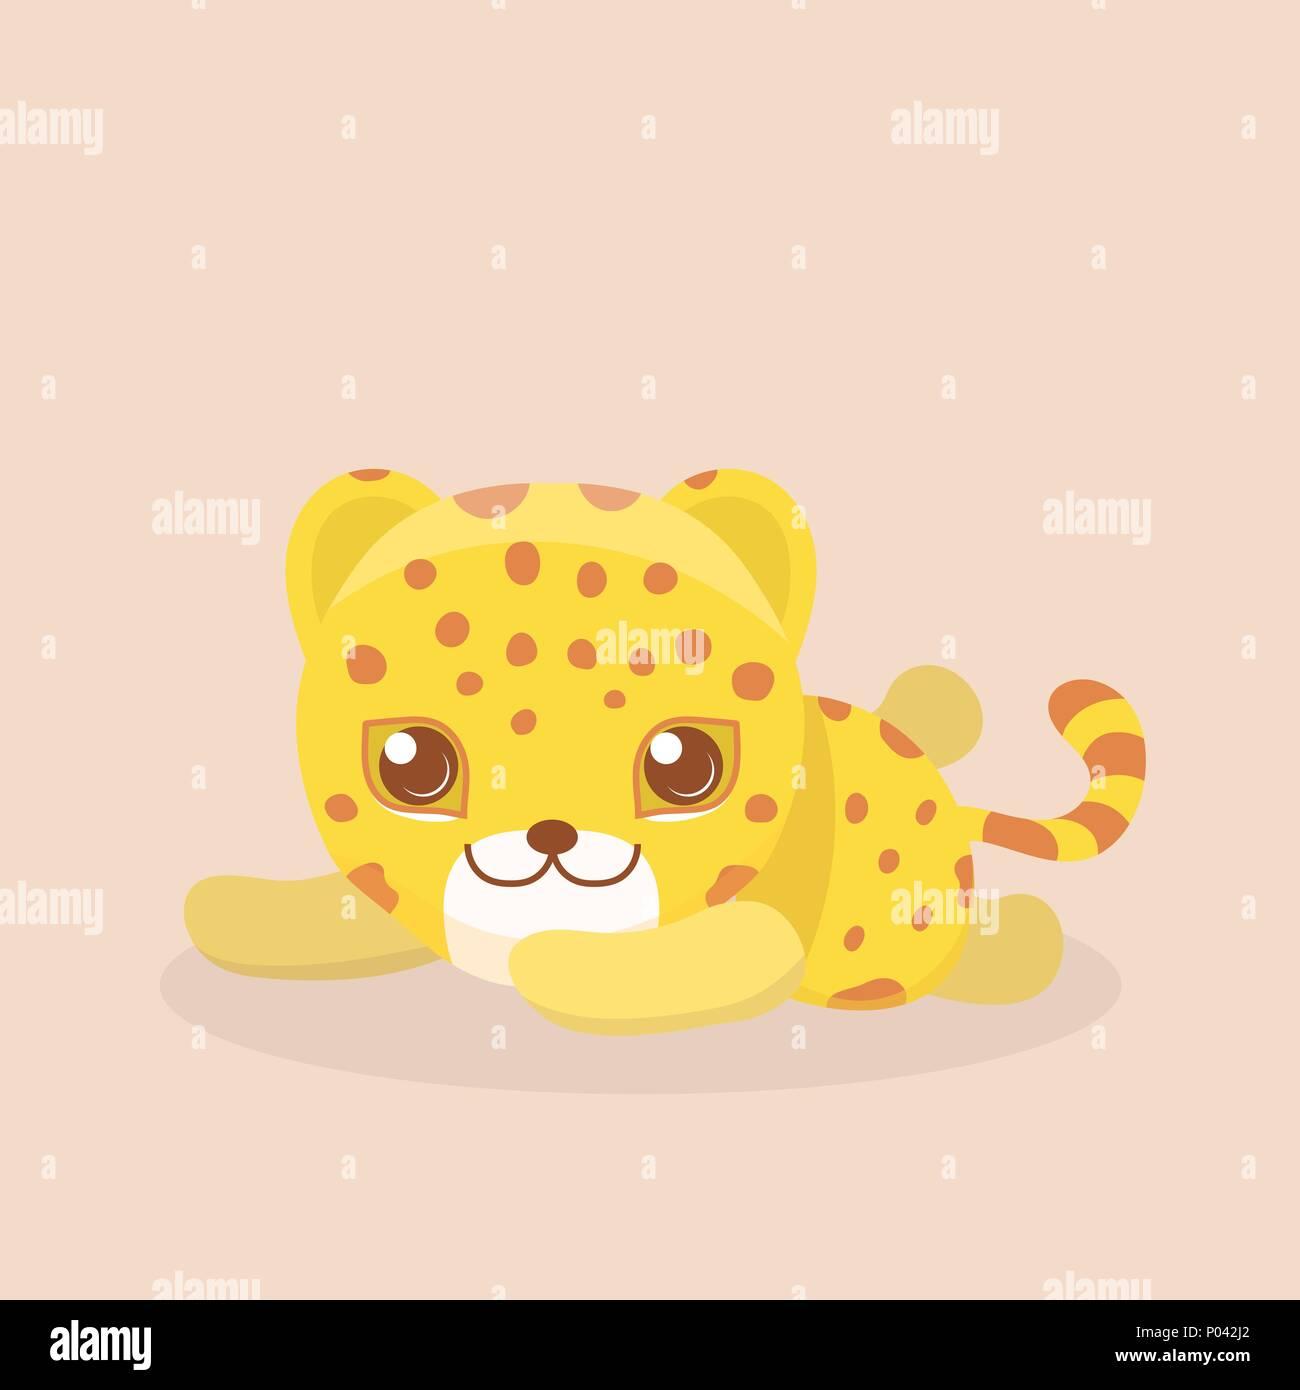 Animated Cheetah Wallpaper cartoon cheetah vector vectors stock photos & cartoon